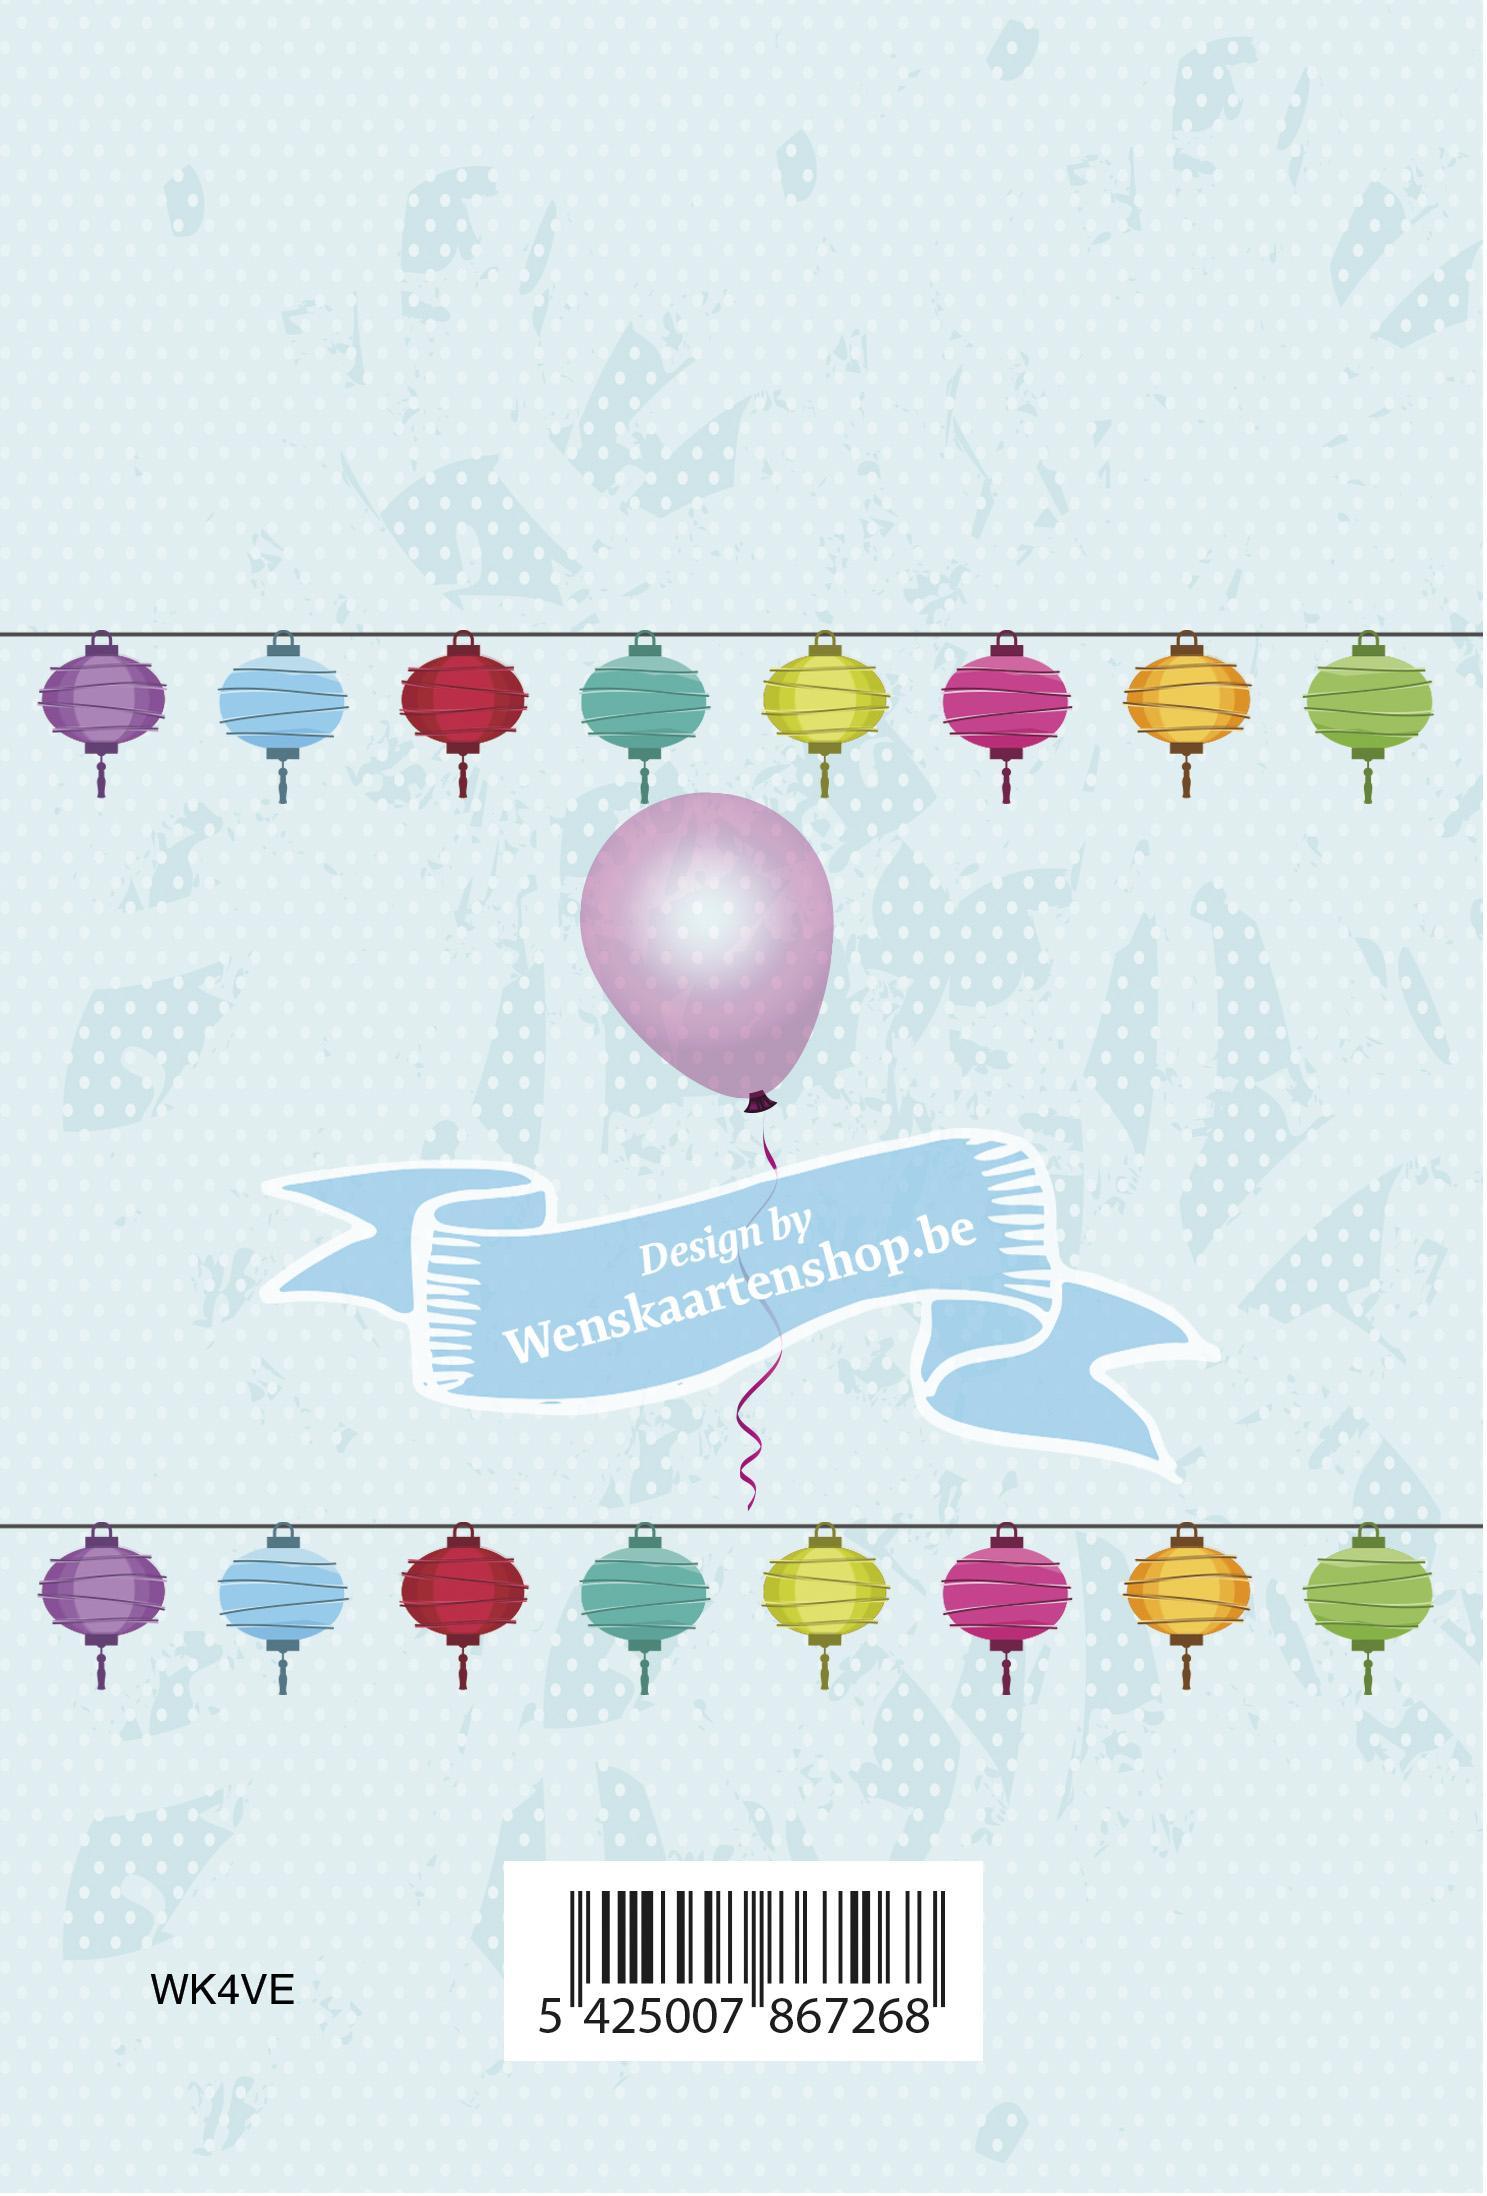 neutrale verjaardagskaart met lampionnen